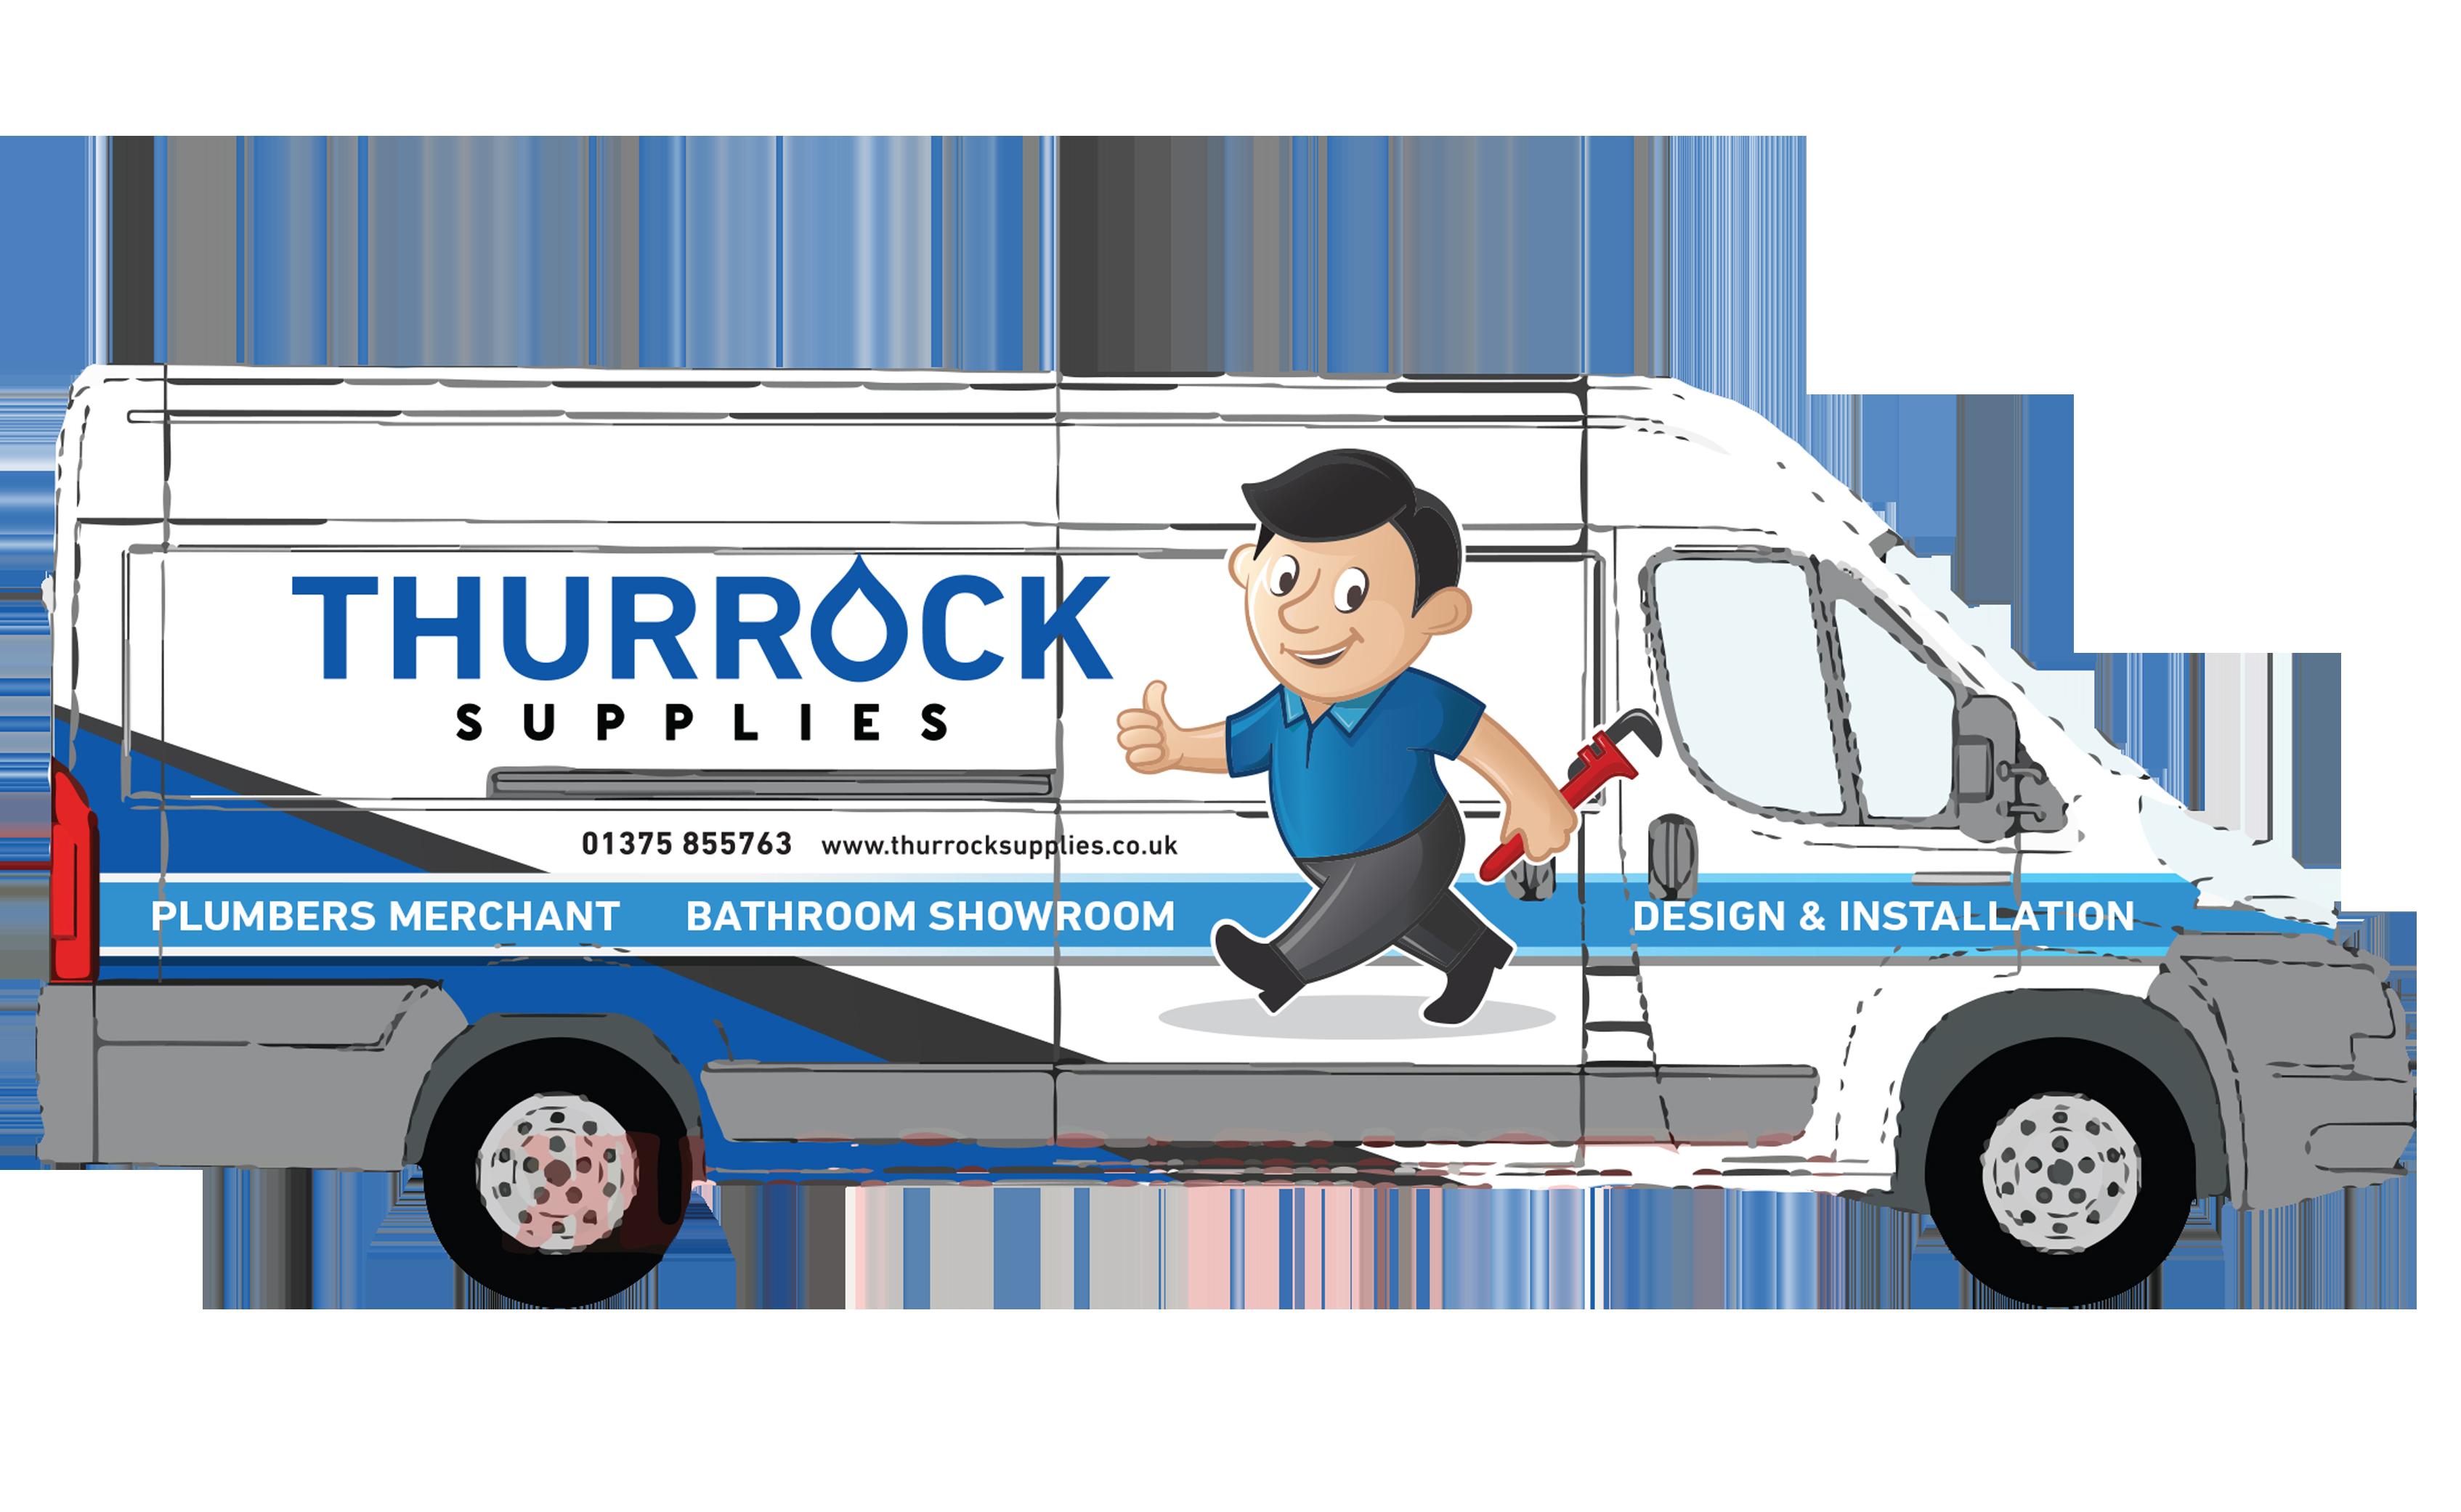 Thurrock Supplies